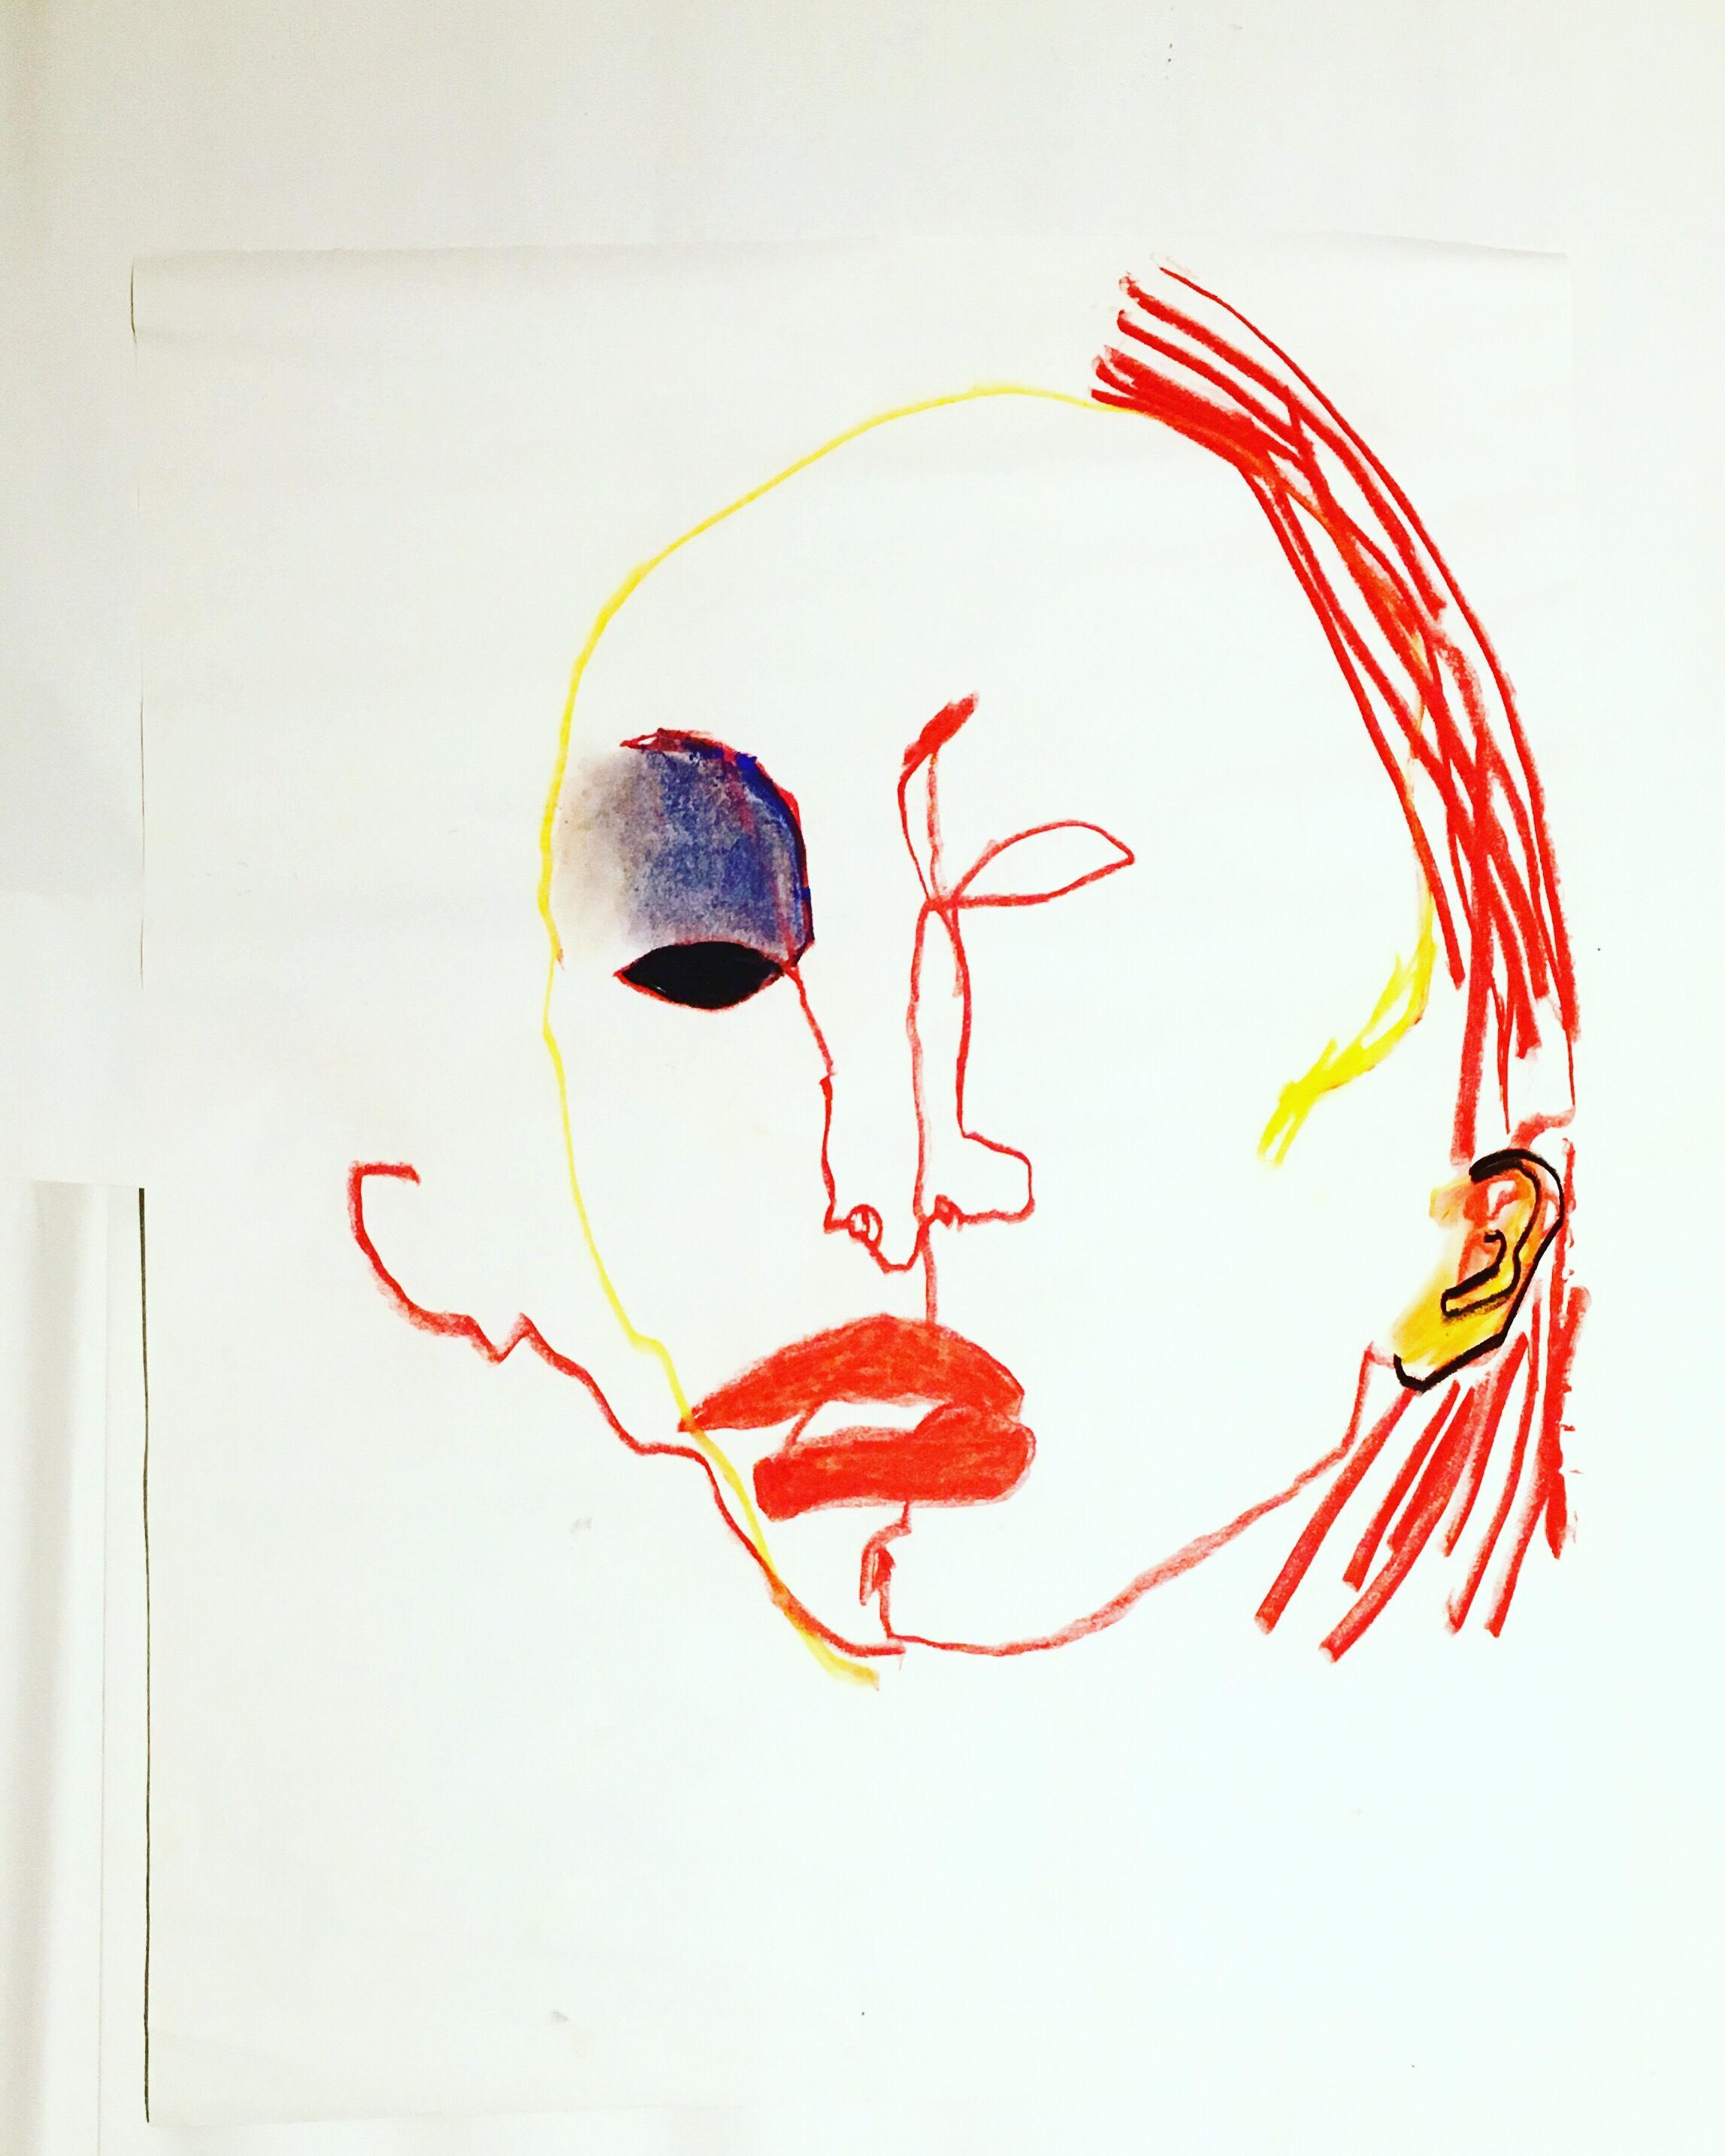 Work by Alice Carman